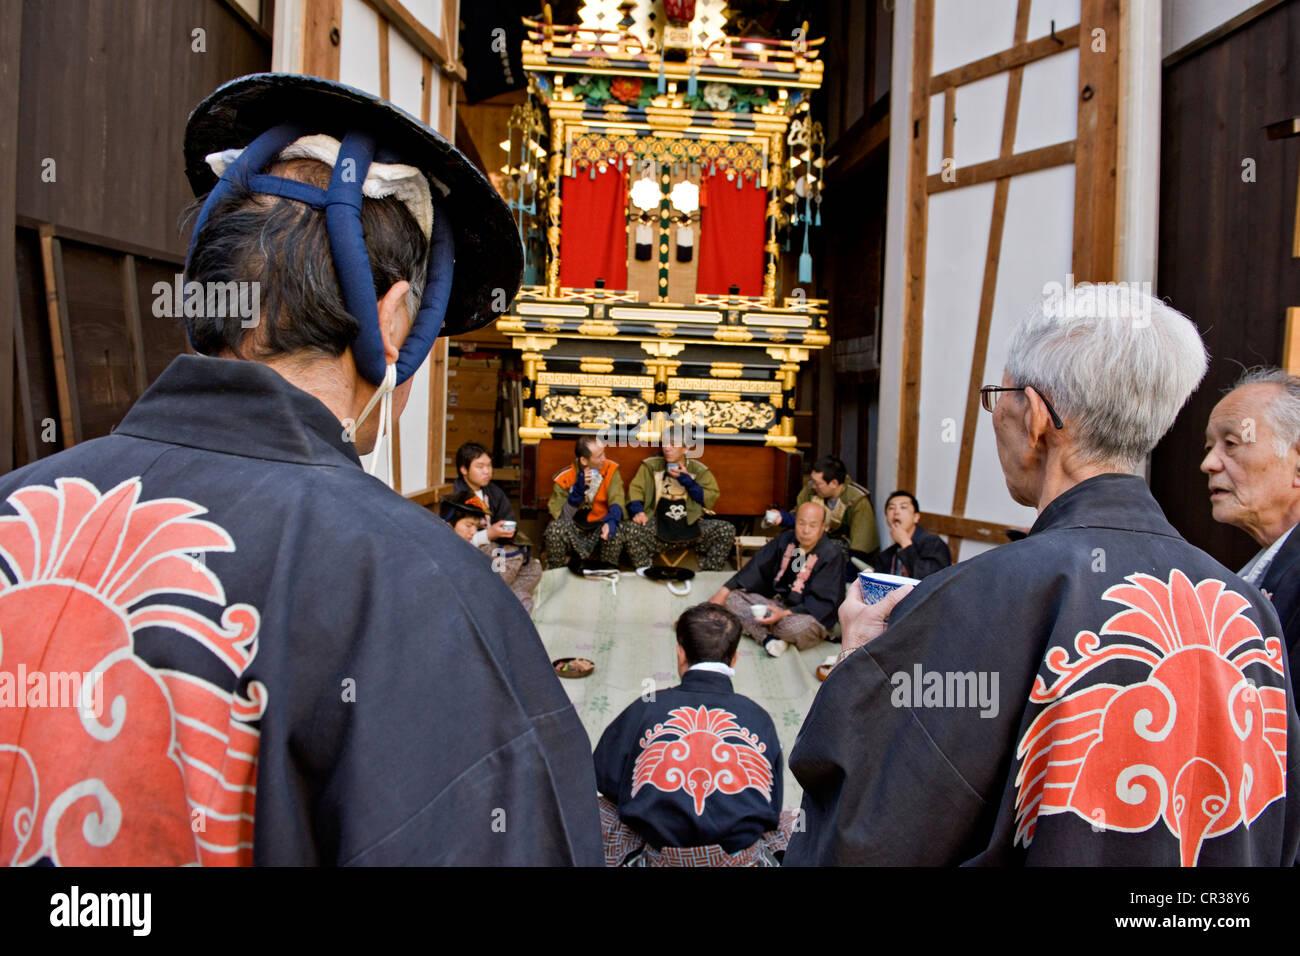 Takayama, Festival oder Sanno Matsuri, Parade der geschmückten Wagen, Chubu Region, Insel Honshu, Japan Stockbild